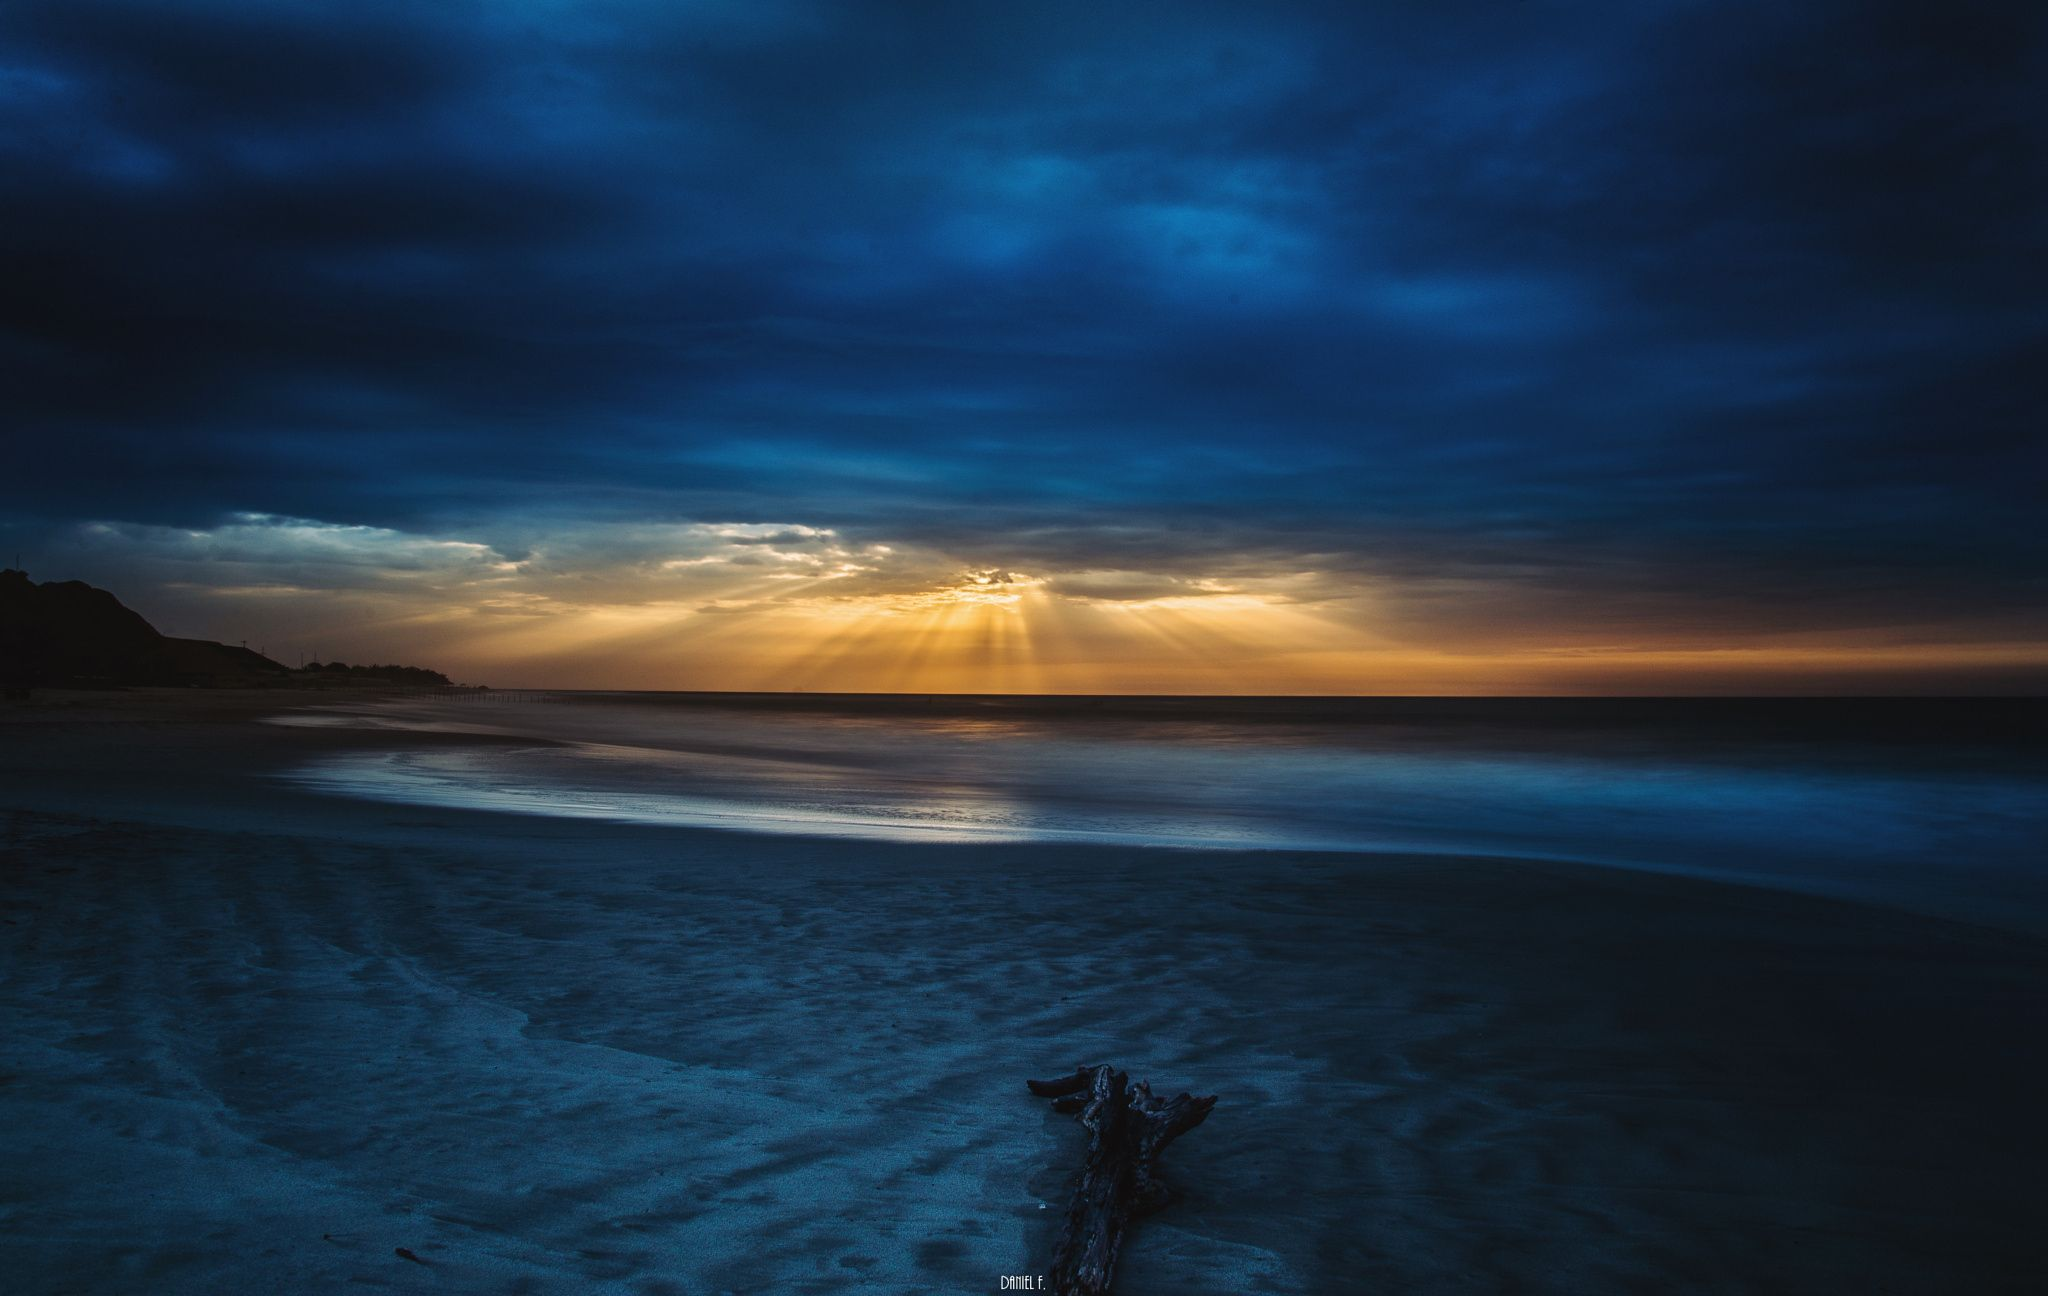 Un atardecer misterioso - Punta sal - Tumbes